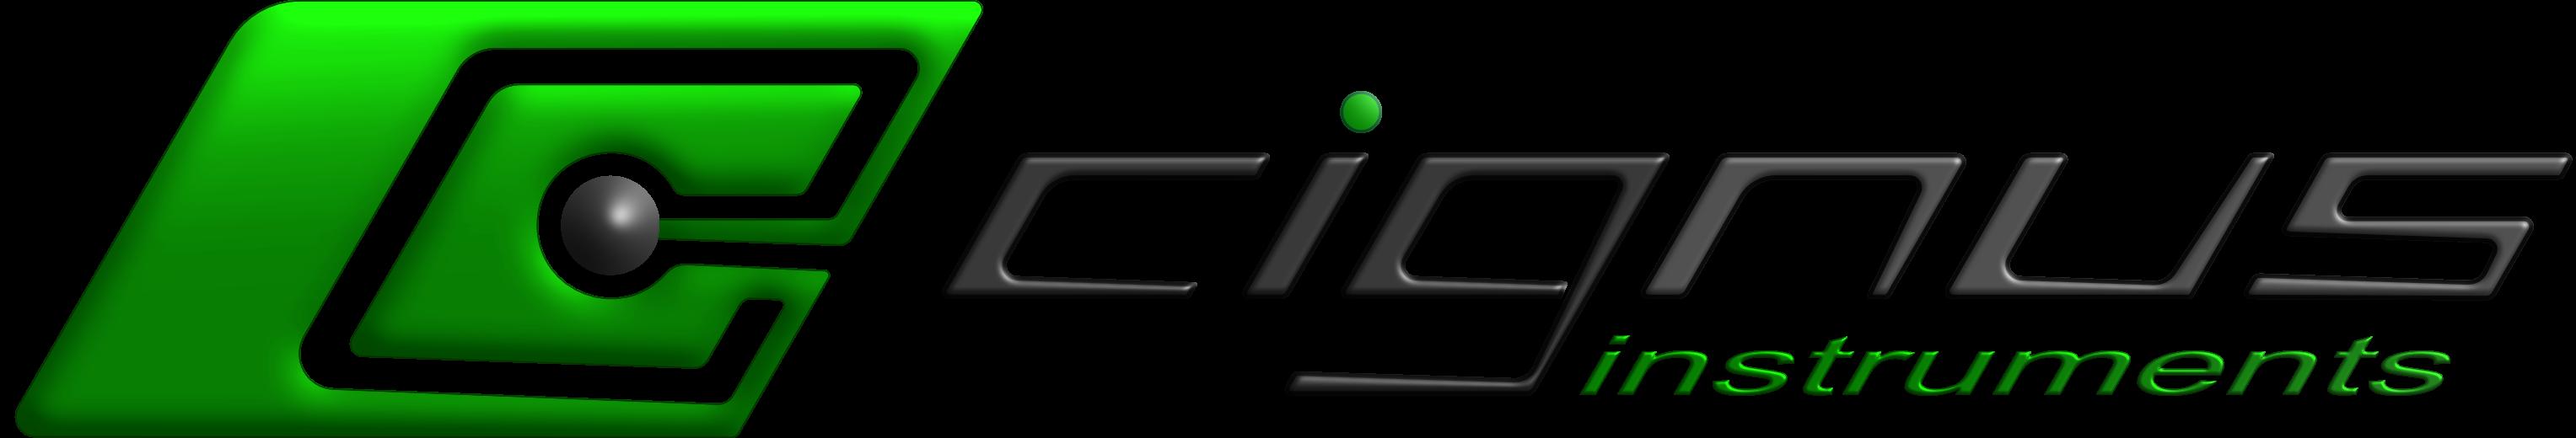 Cignus Instruments